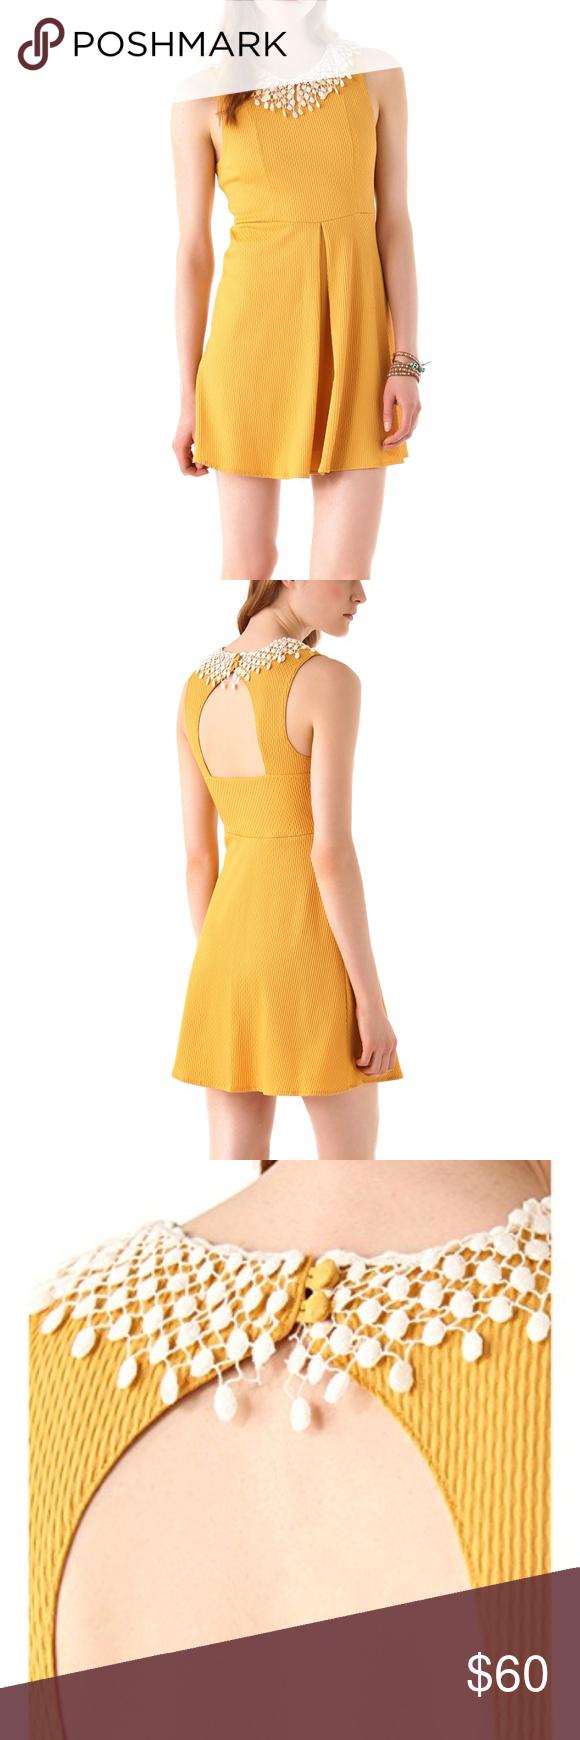 Free People Waffle Knit Dress Sz L Knit Shift Dress Knit Dress Waffle Knit [ 1740 x 580 Pixel ]